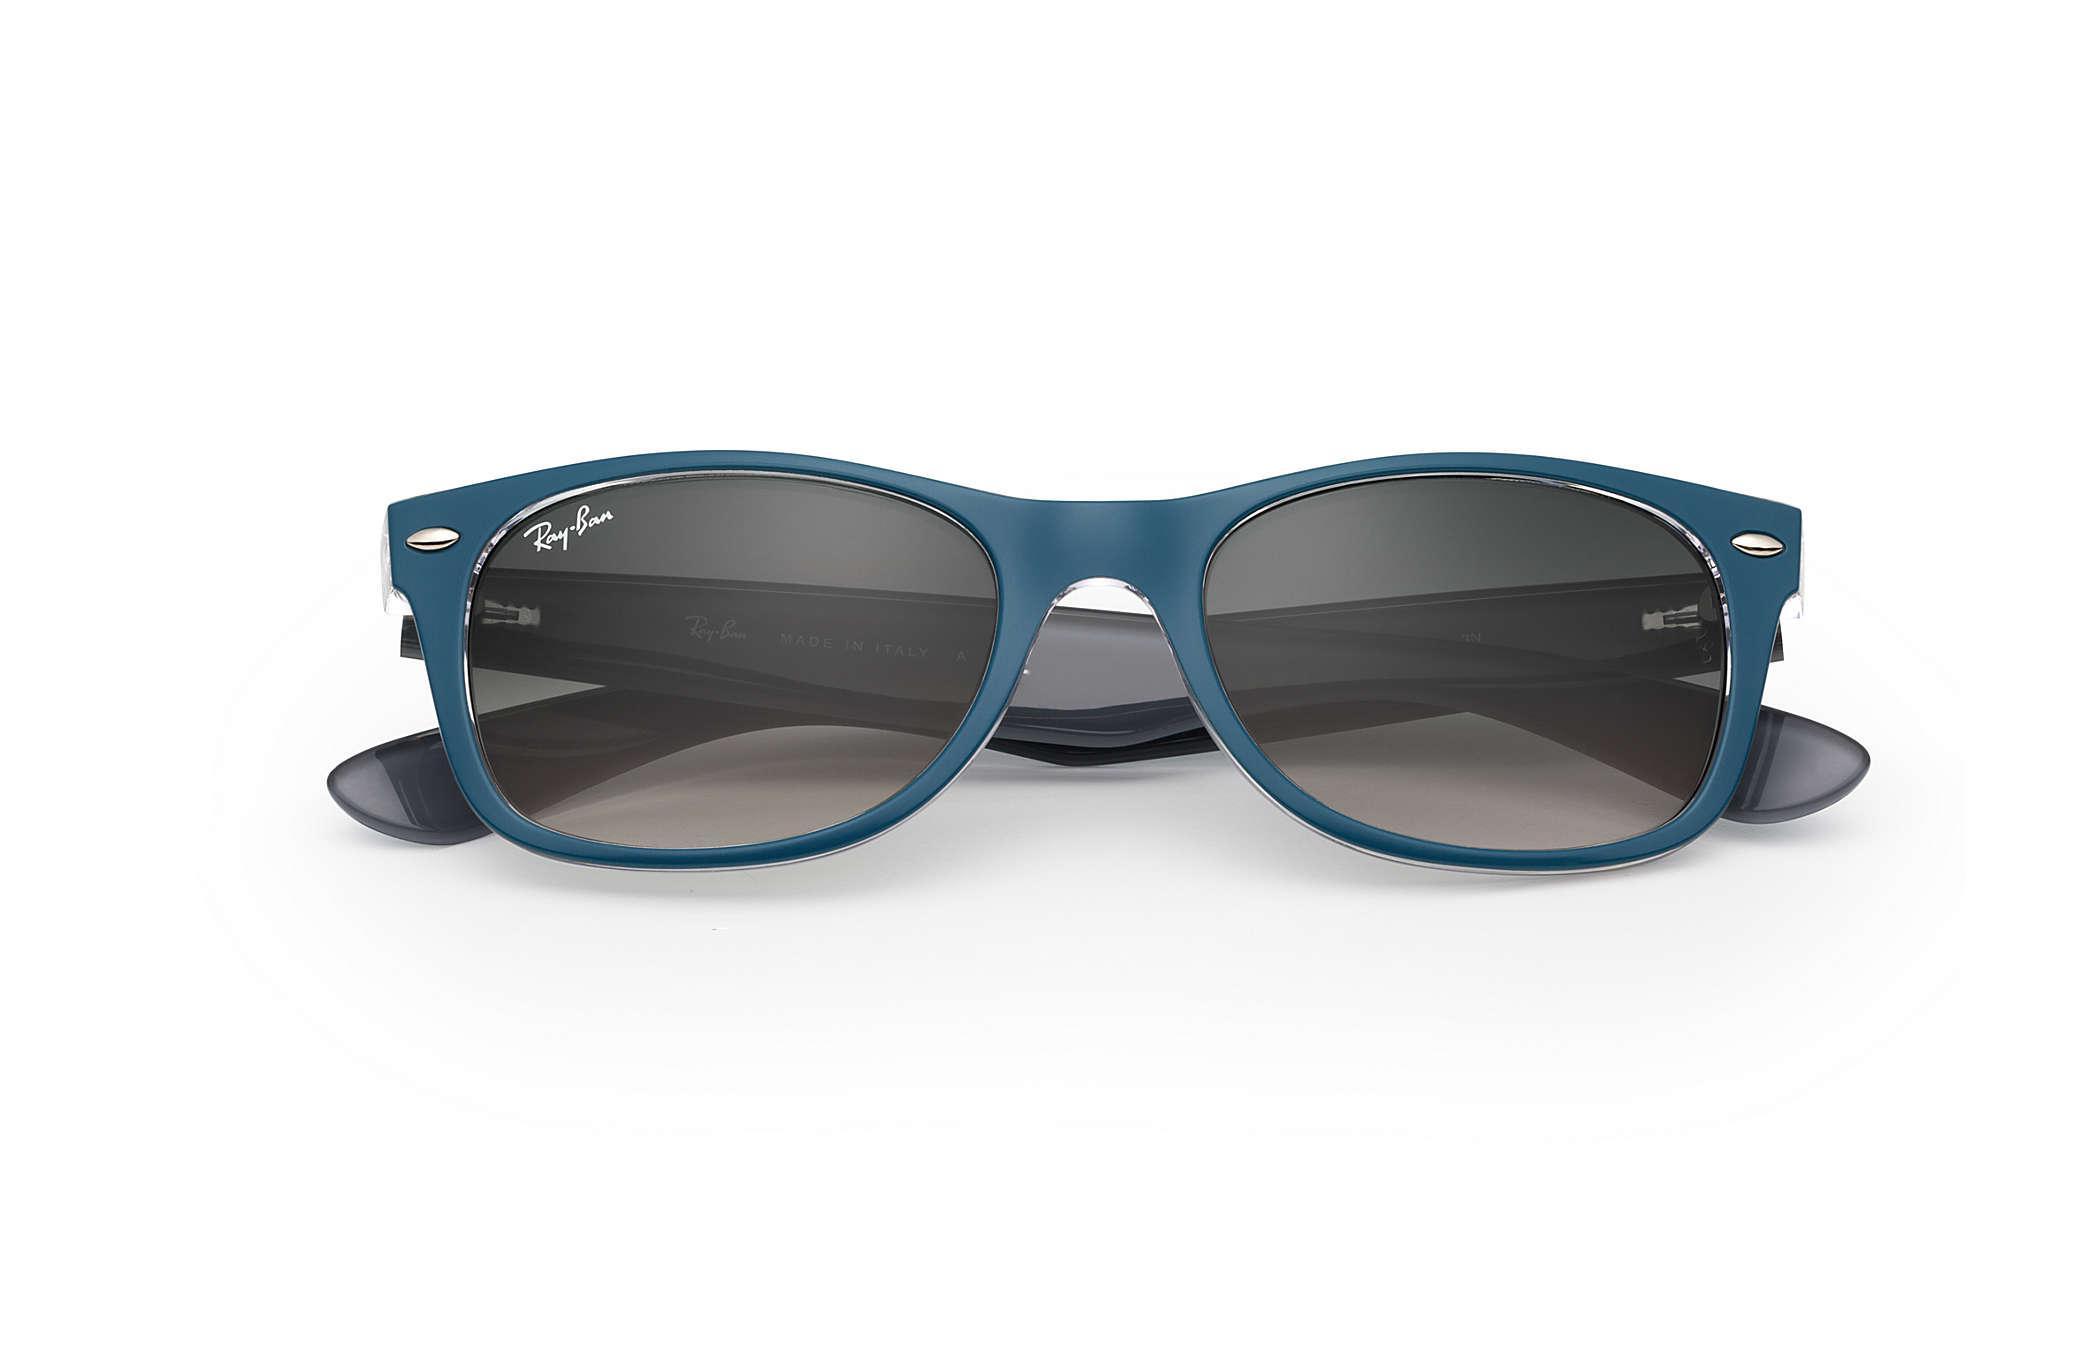 Ray-Ban - Blue New Wayfarer Bicolor for Men - Lyst. View fullscreen 5e9899efcc21